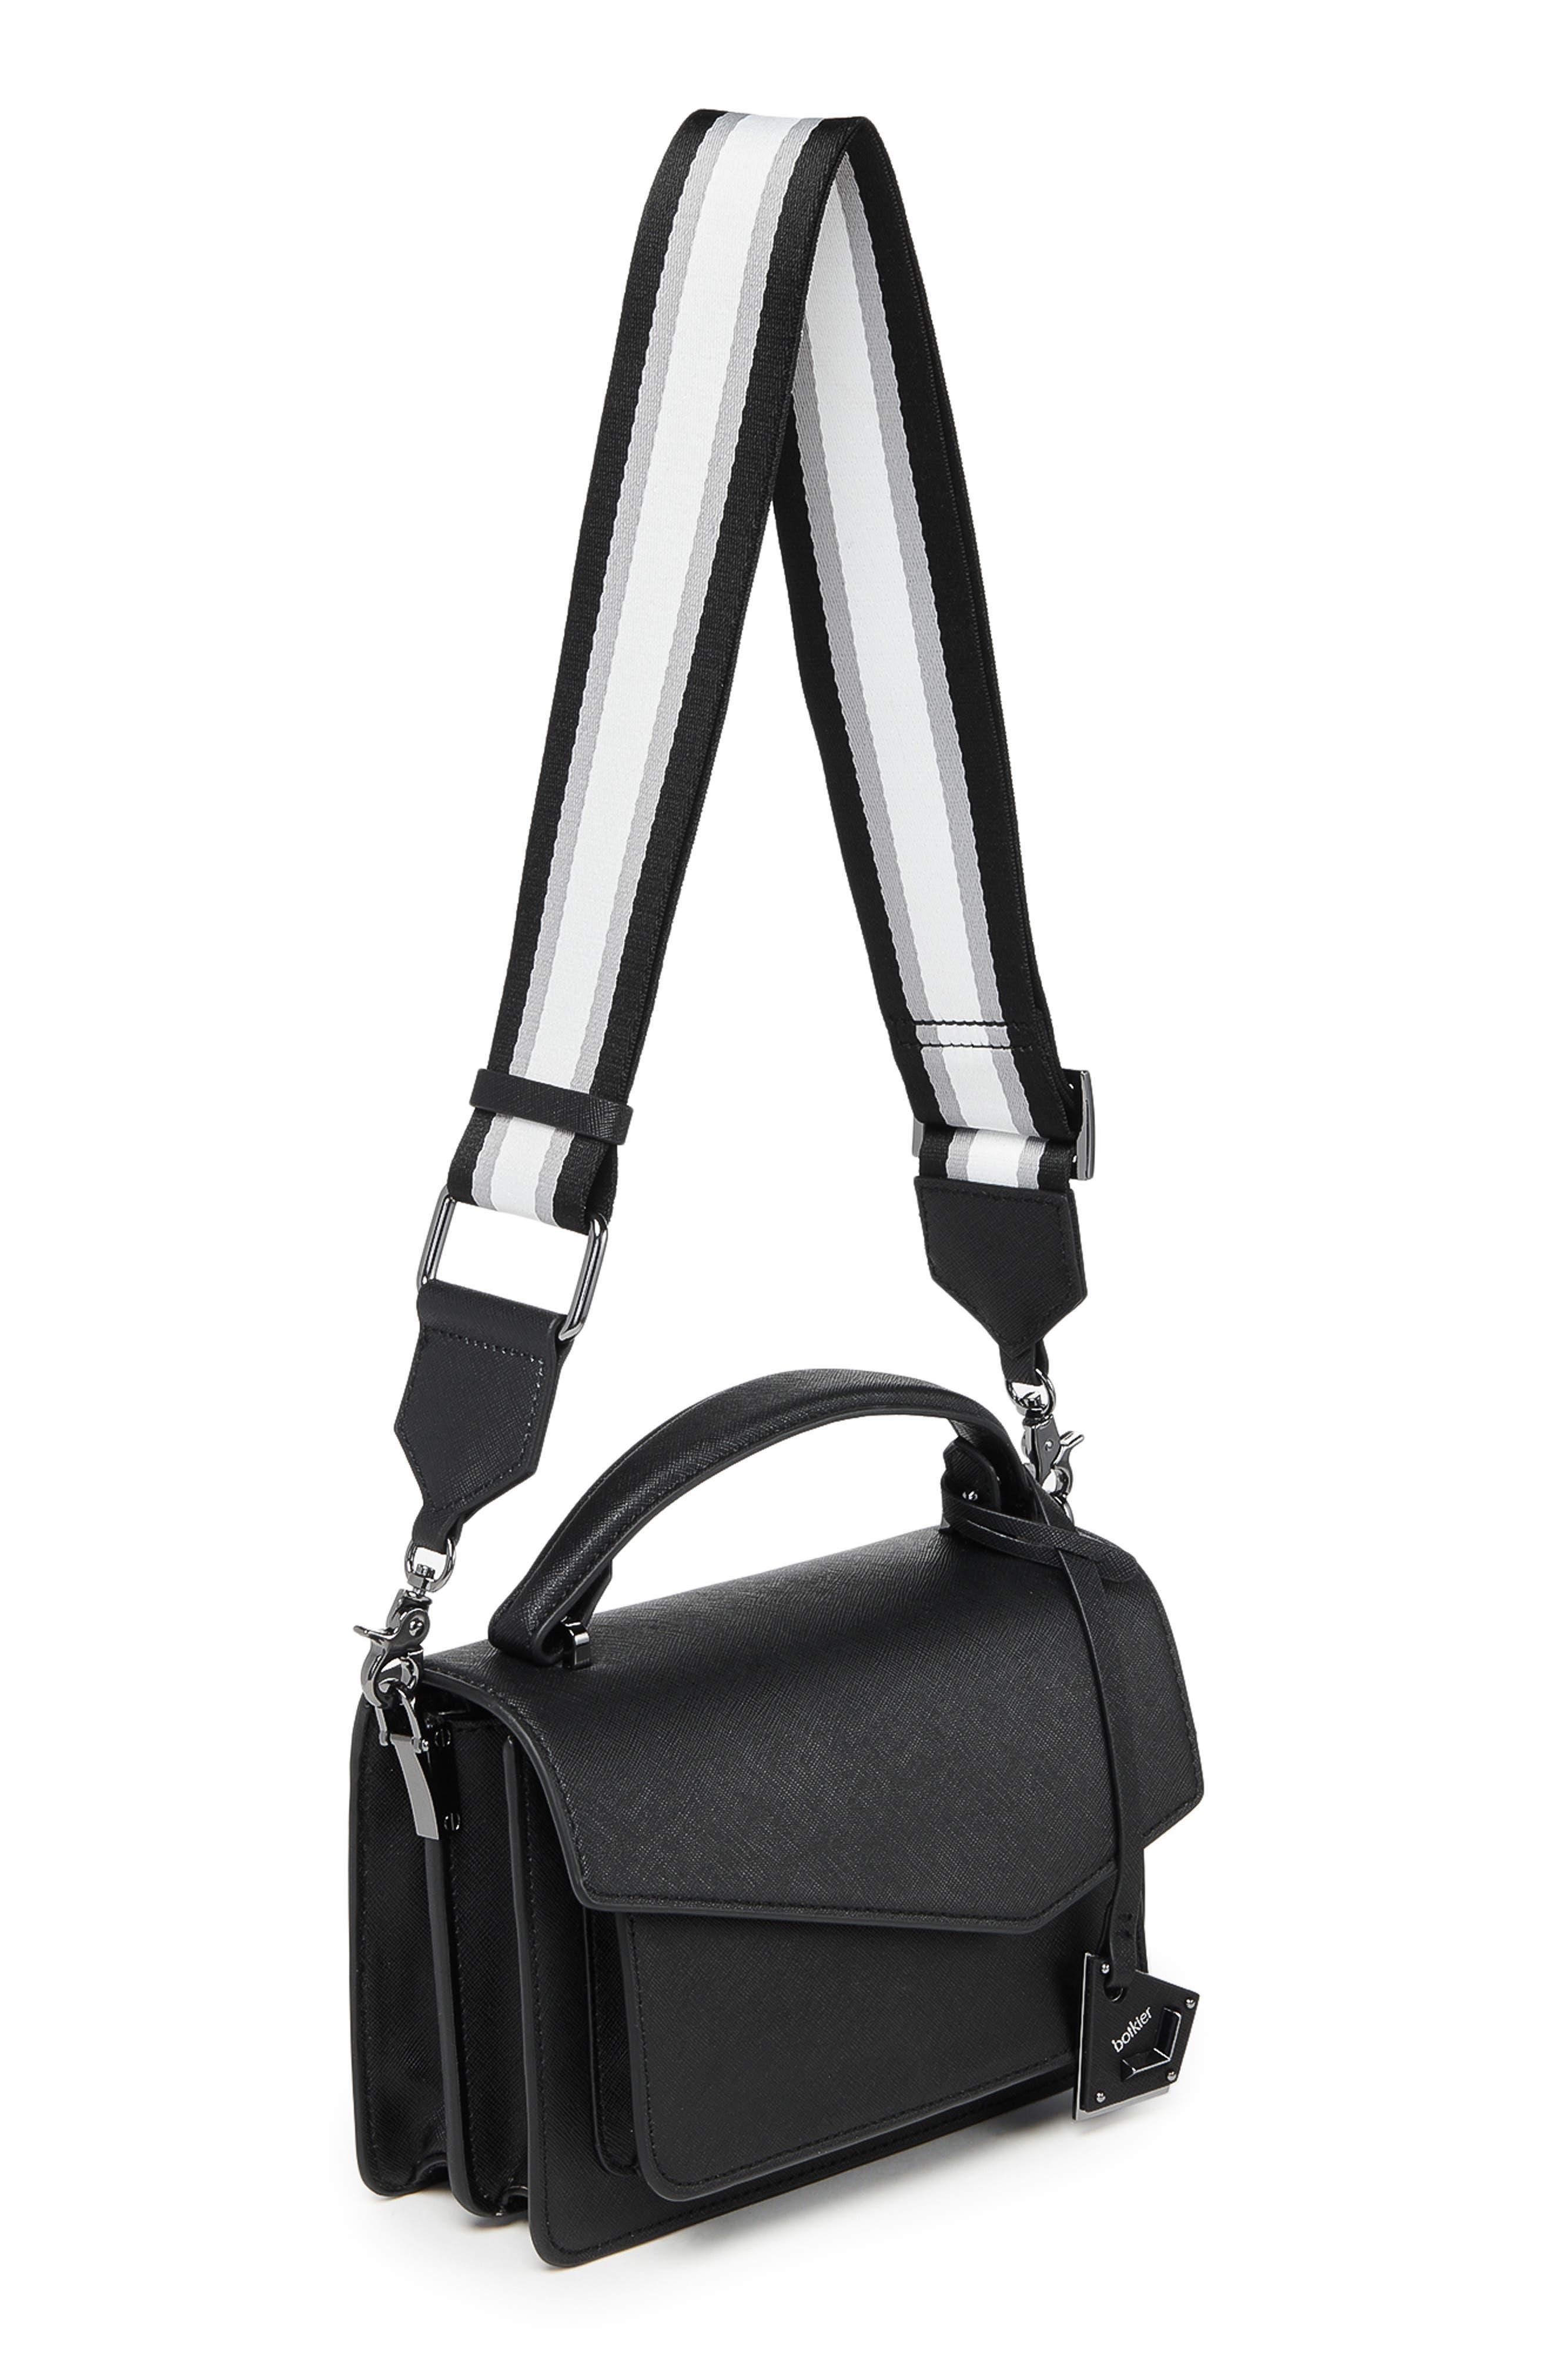 BOTKIER, Cobble Hill Leather Crossbody Bag, Alternate thumbnail 5, color, BLACK